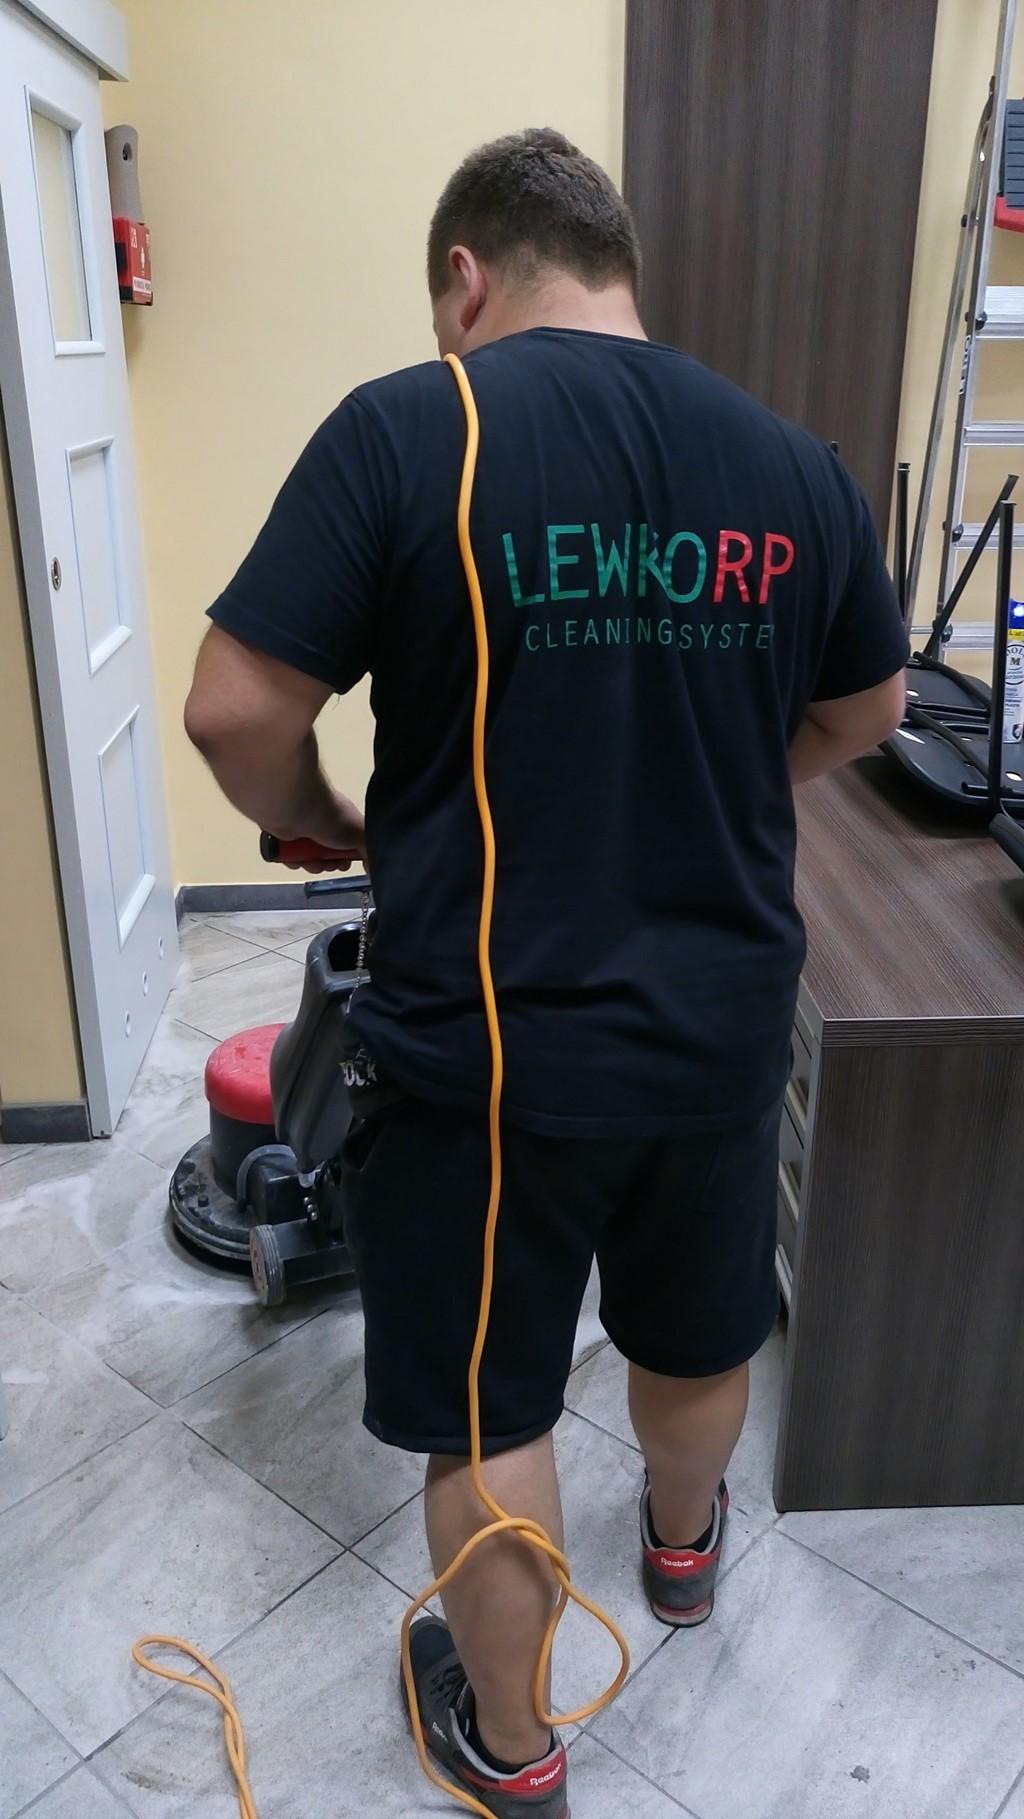 Sprzątanie biur - Lewkorp Legnica